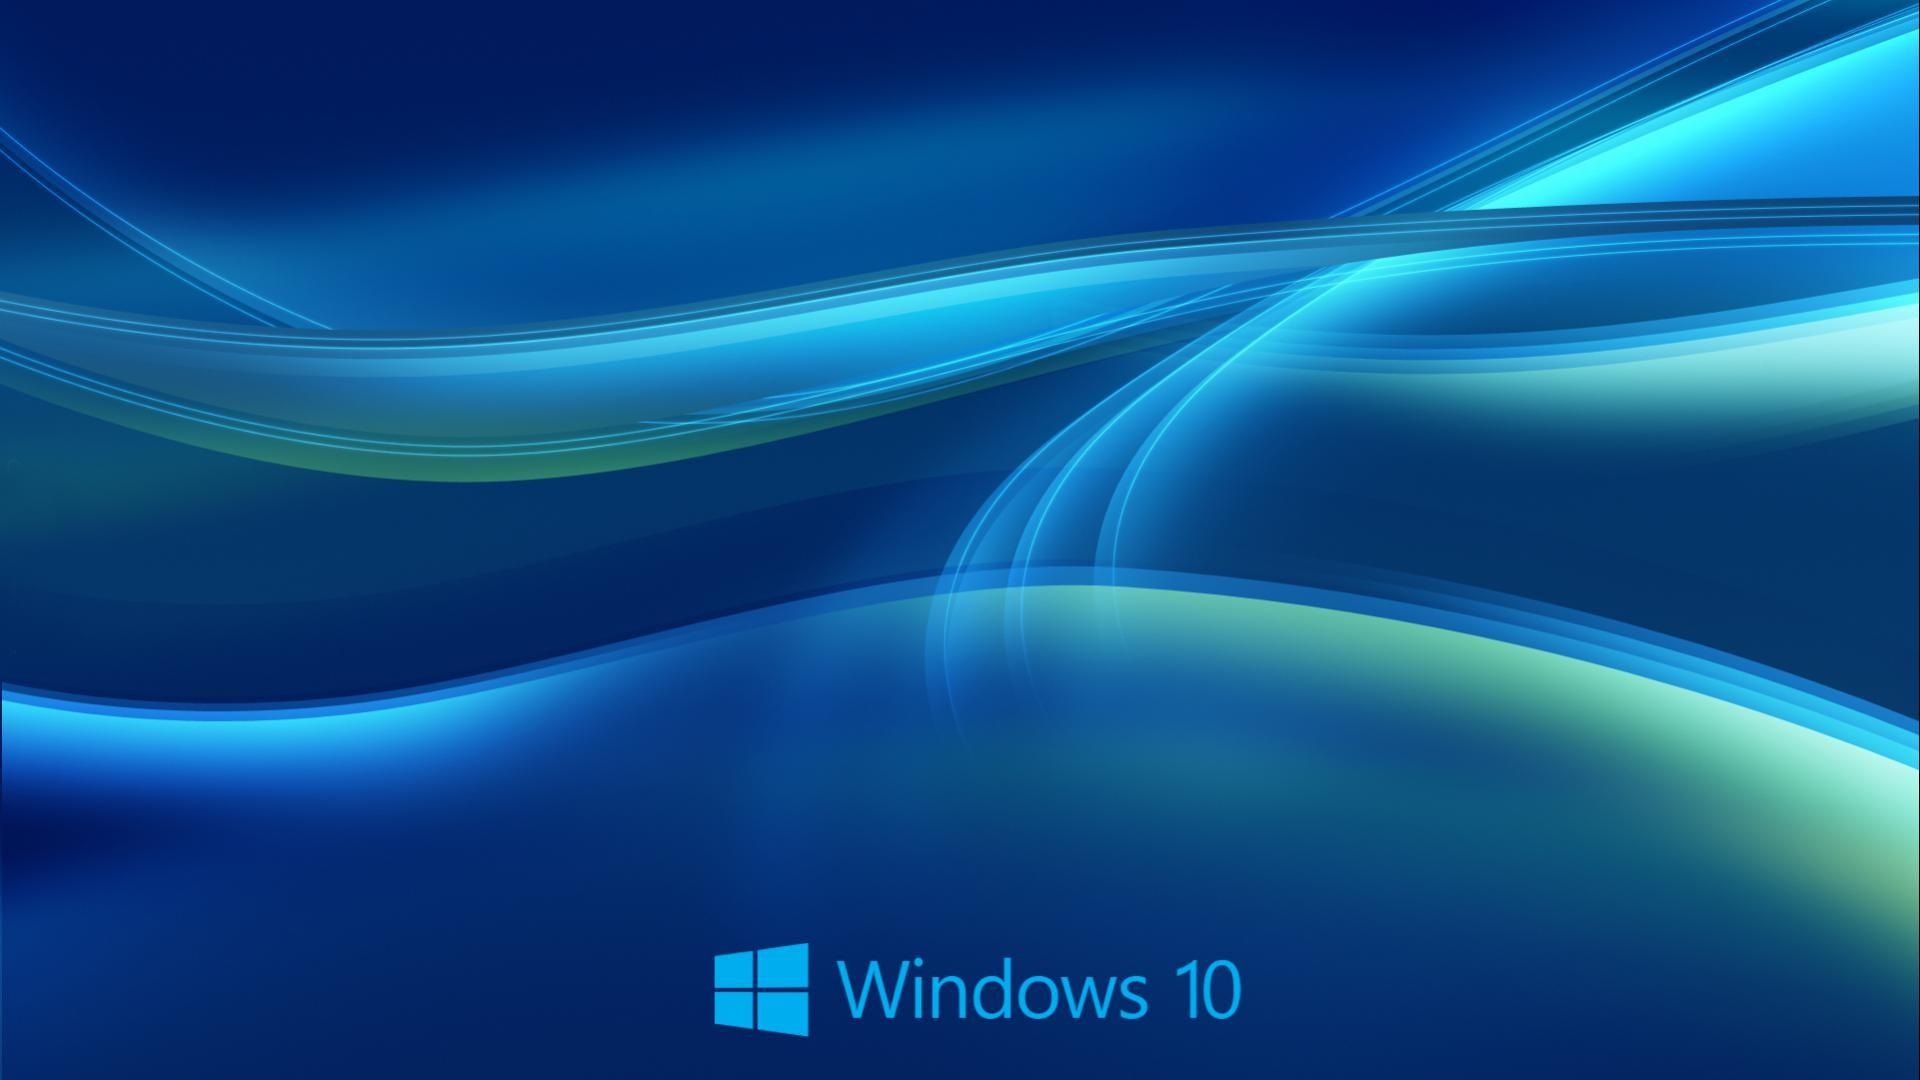 1920x1080 Hd Wallpaper Windows Reflective